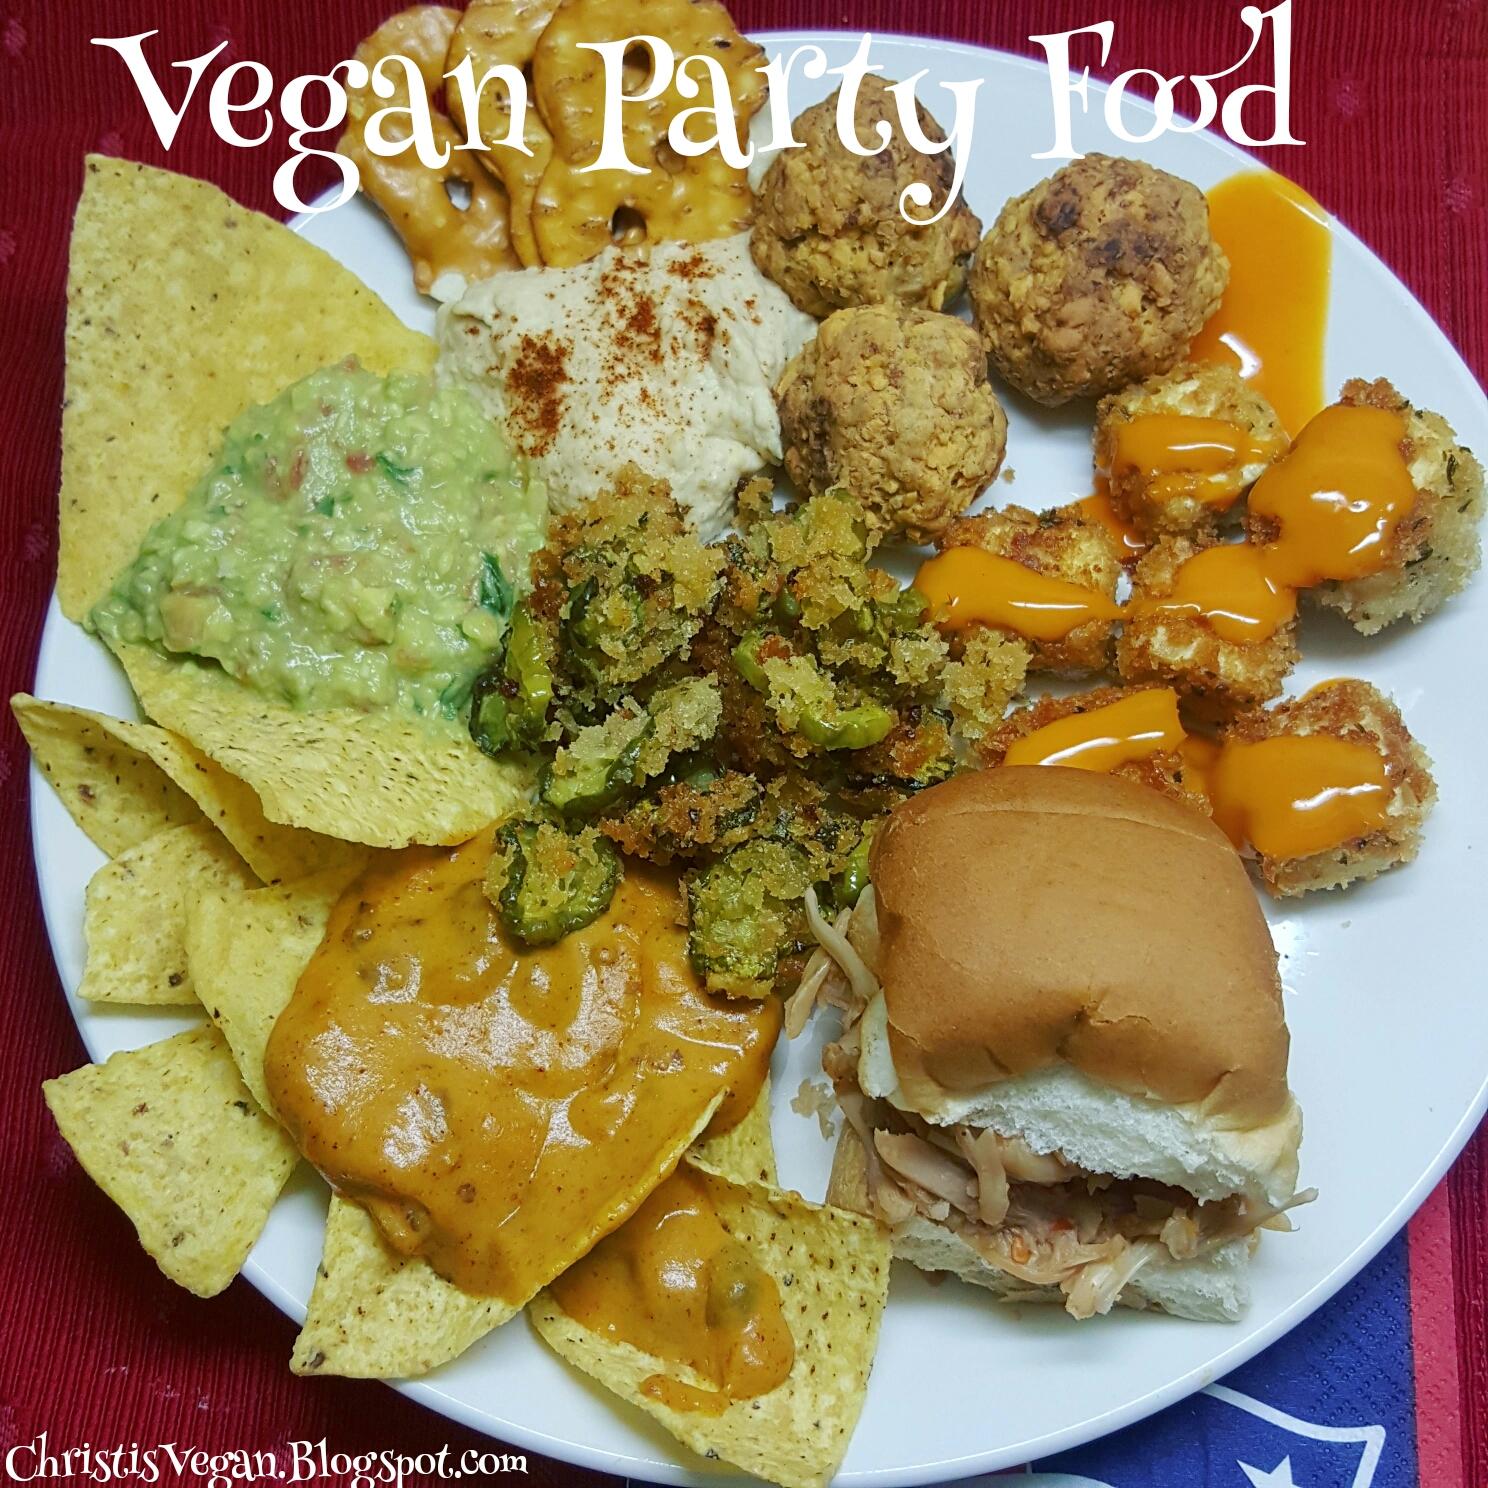 Christi's Vegan Life: Vegan Party Food